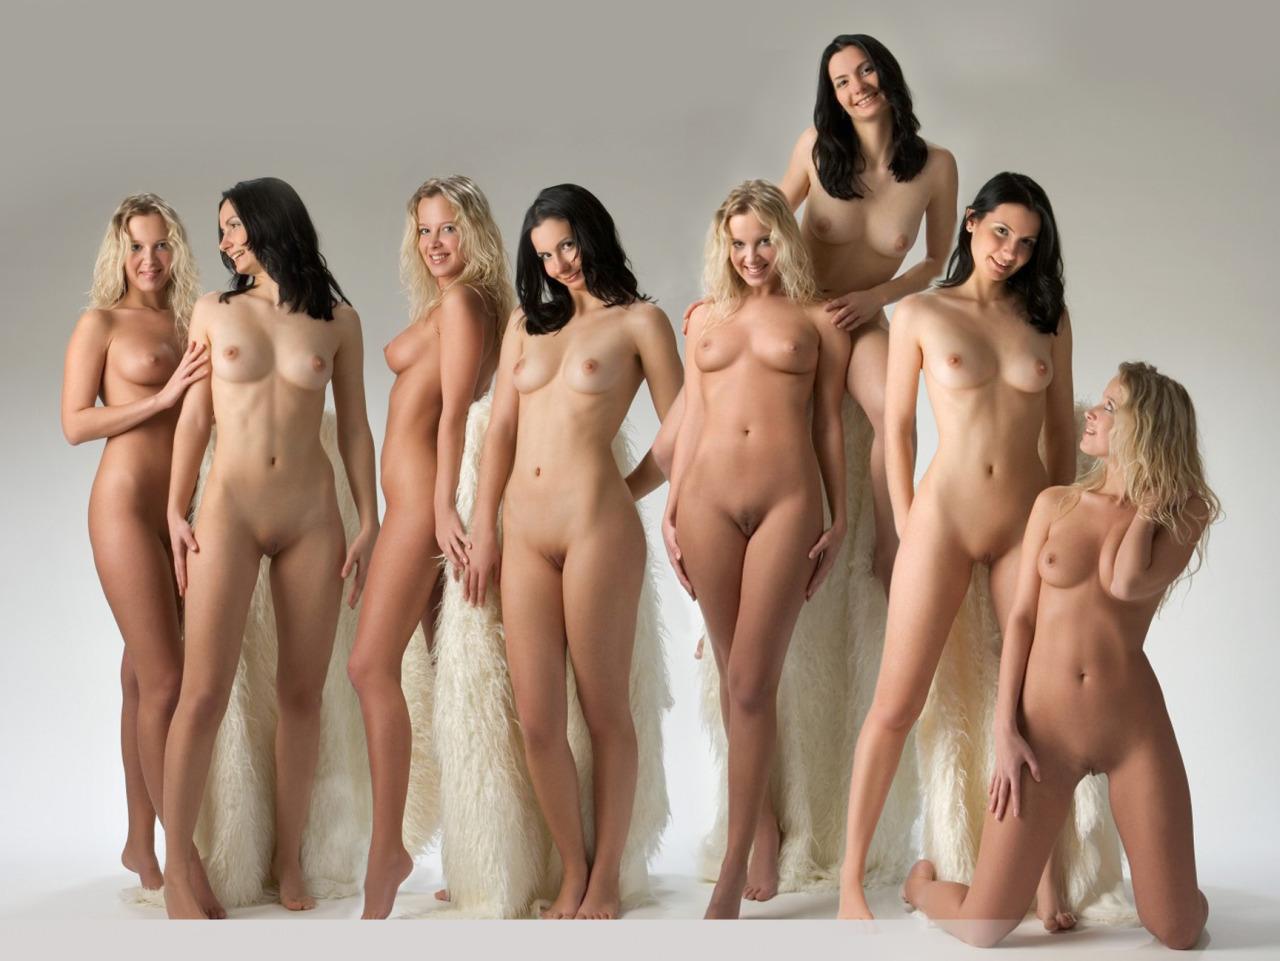 beauty nudist girl standing